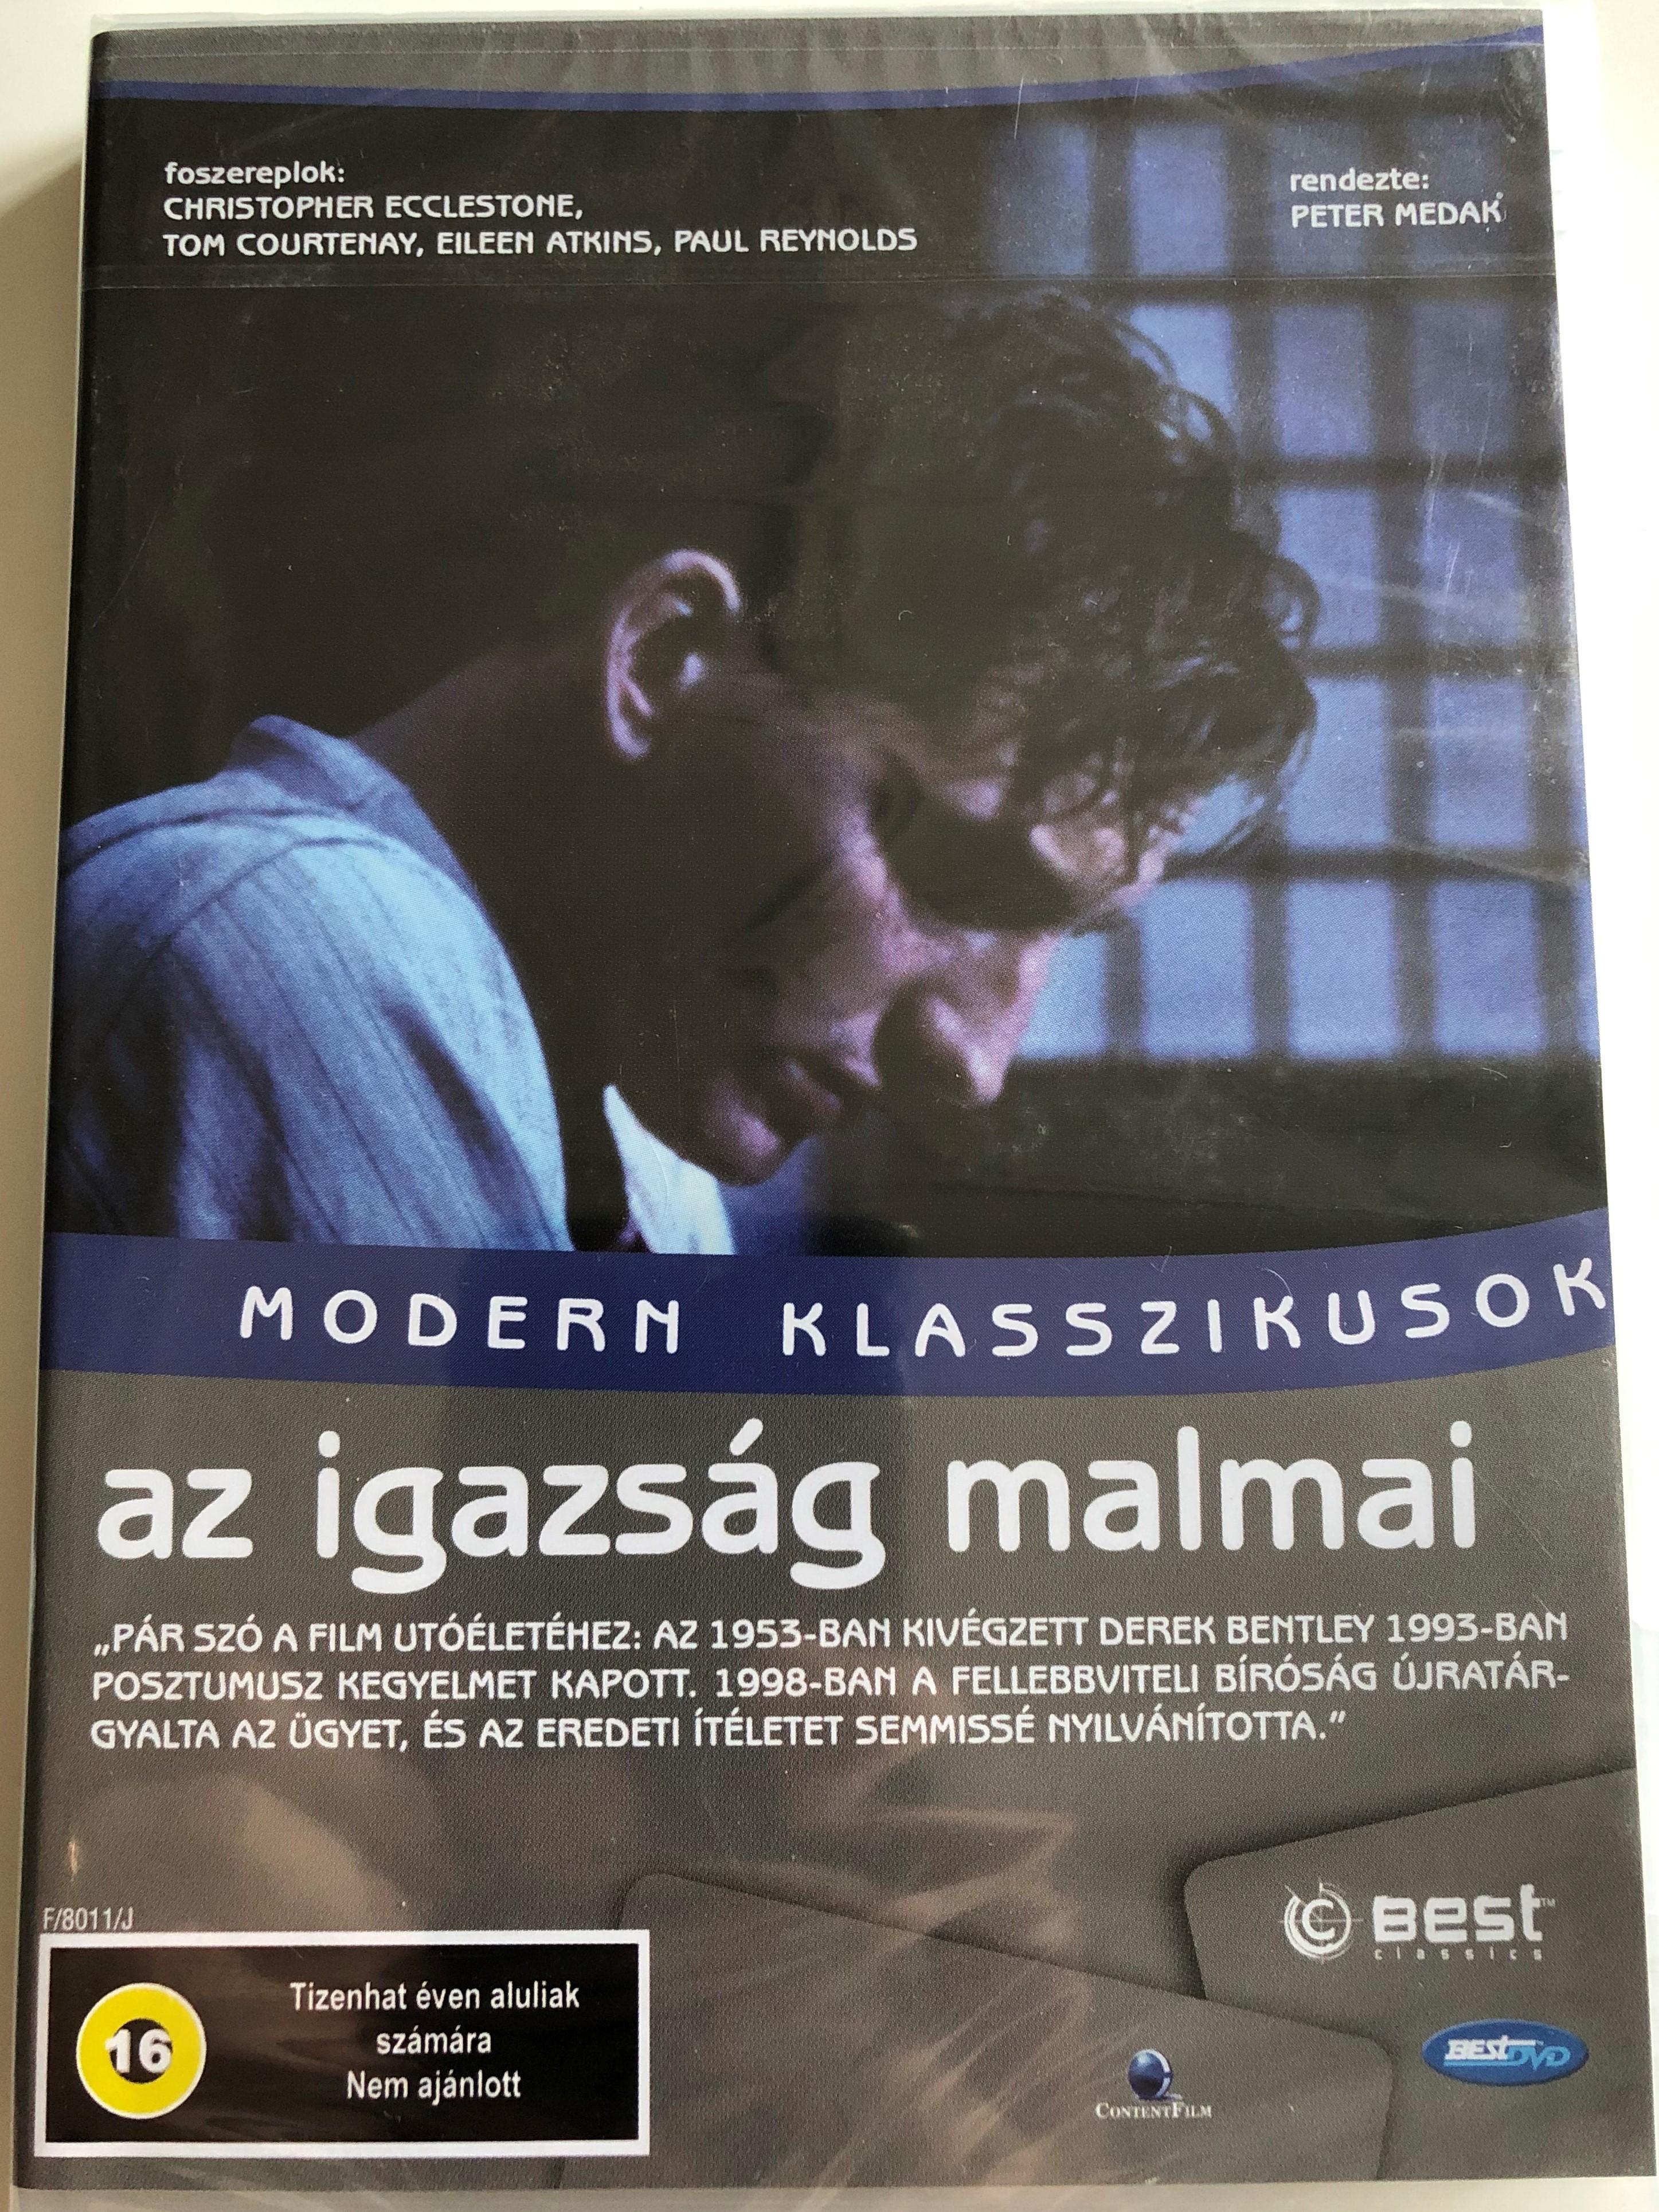 let-him-have-it-dvd-az-igazs-g-malmai-directed-by-peter-medak-1.jpg